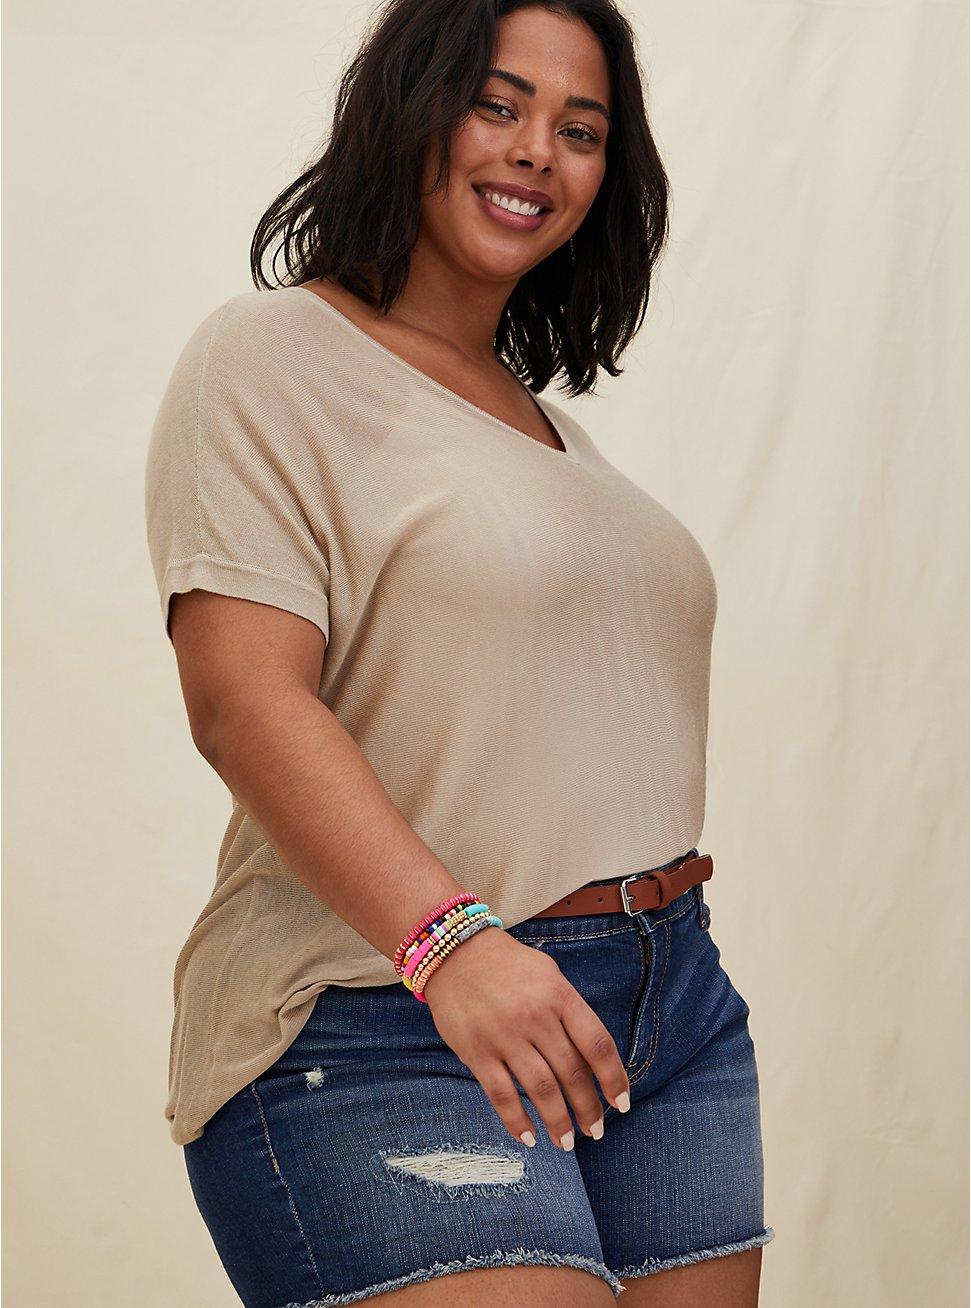 Plus Size Multi Bead & Coin Charm Stretch Bracelet Set - Set of 5, MULTI, hi-res